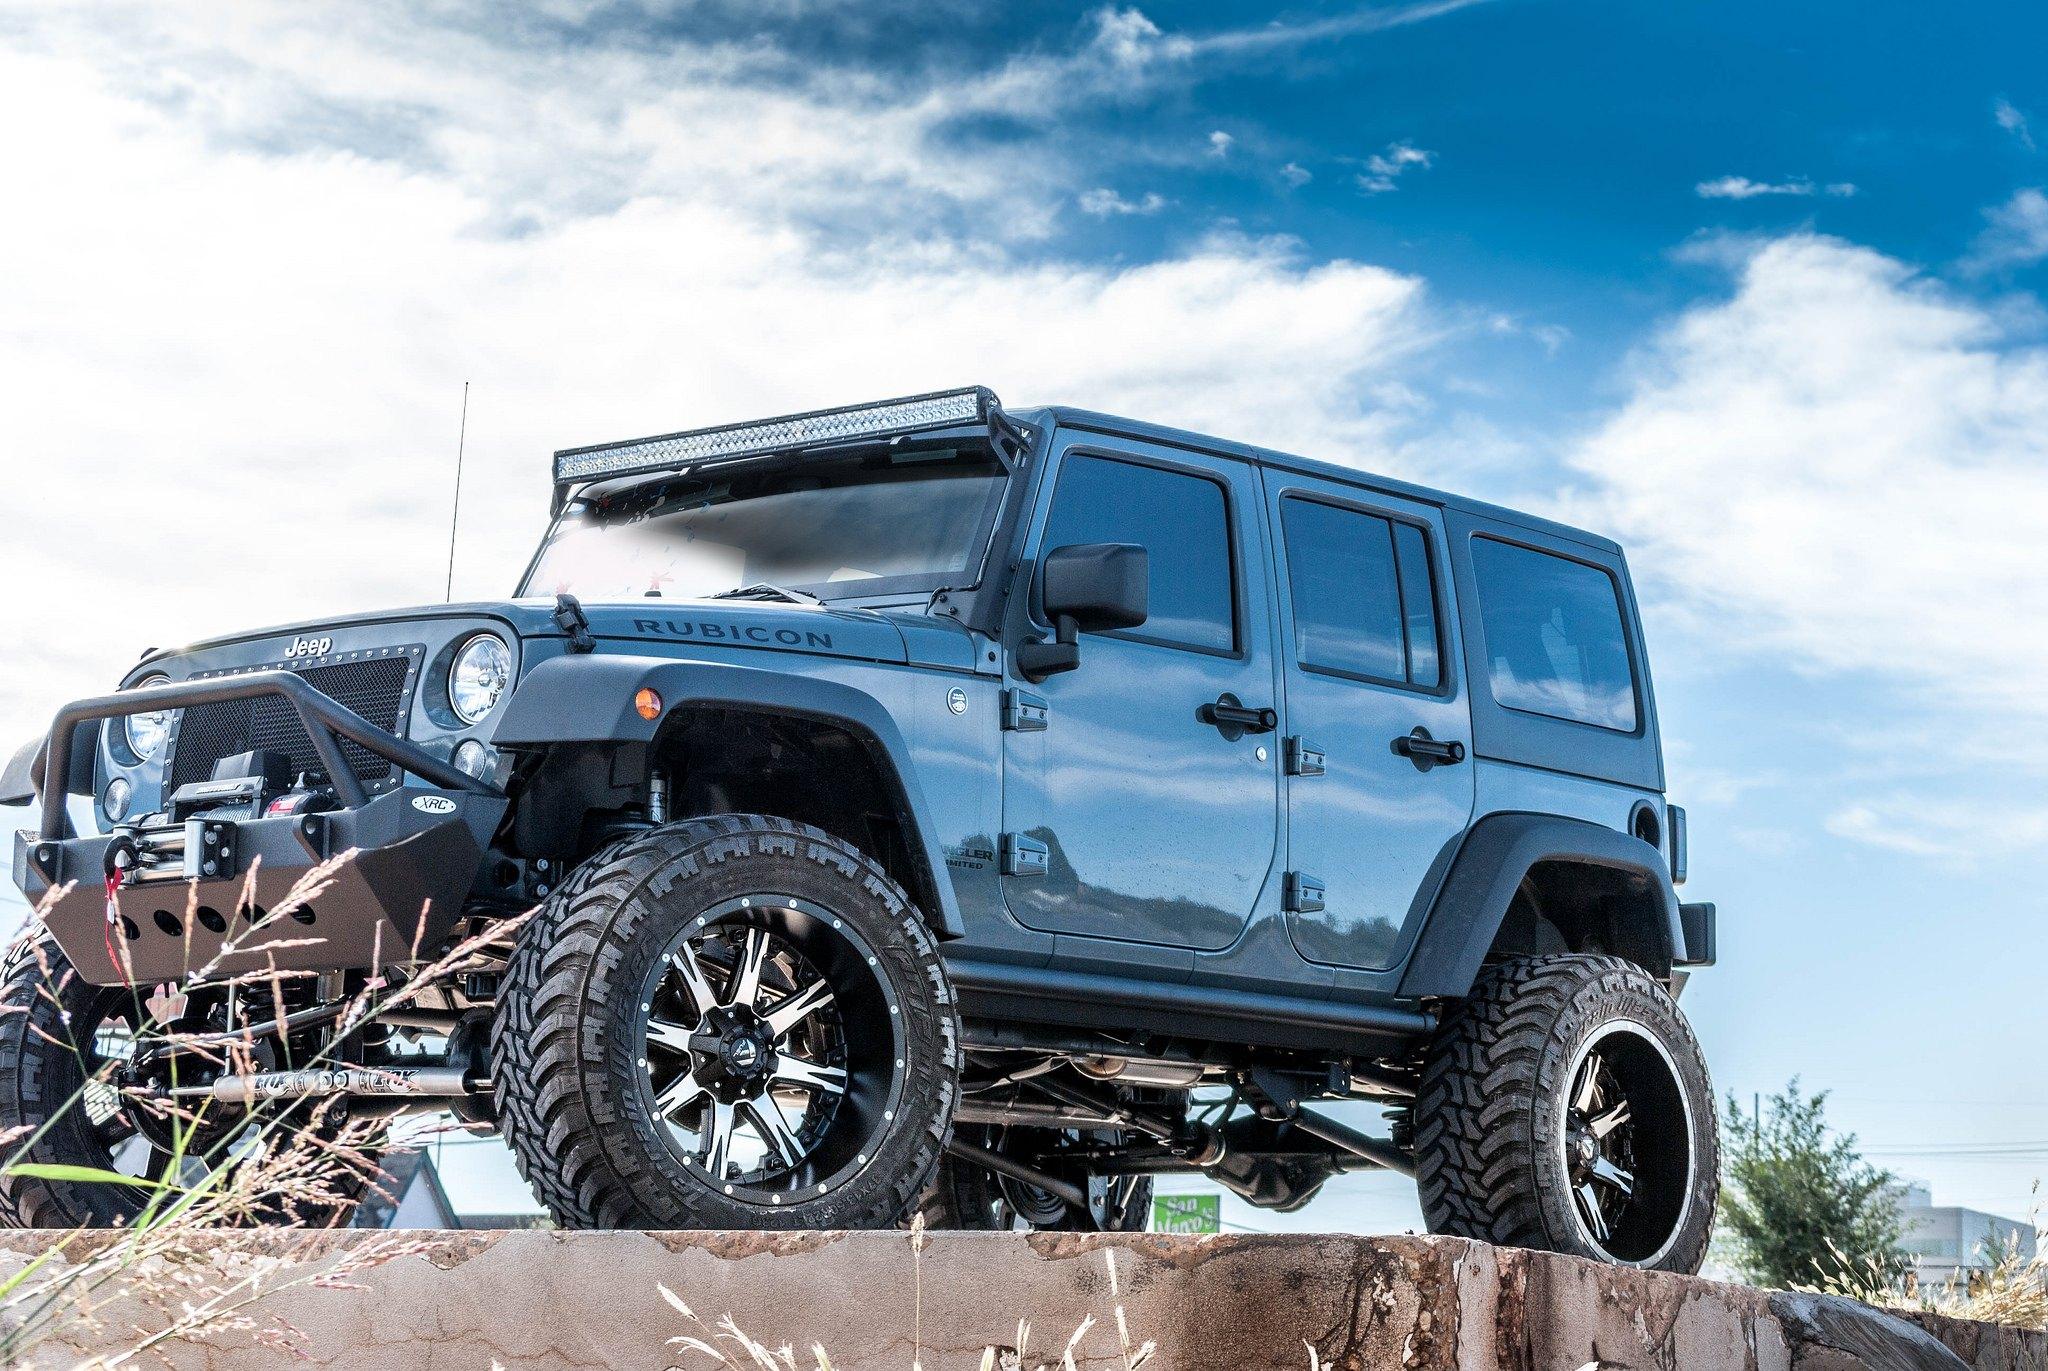 insane off road mods on tough jeep wrangler unlimited gallery. Black Bedroom Furniture Sets. Home Design Ideas